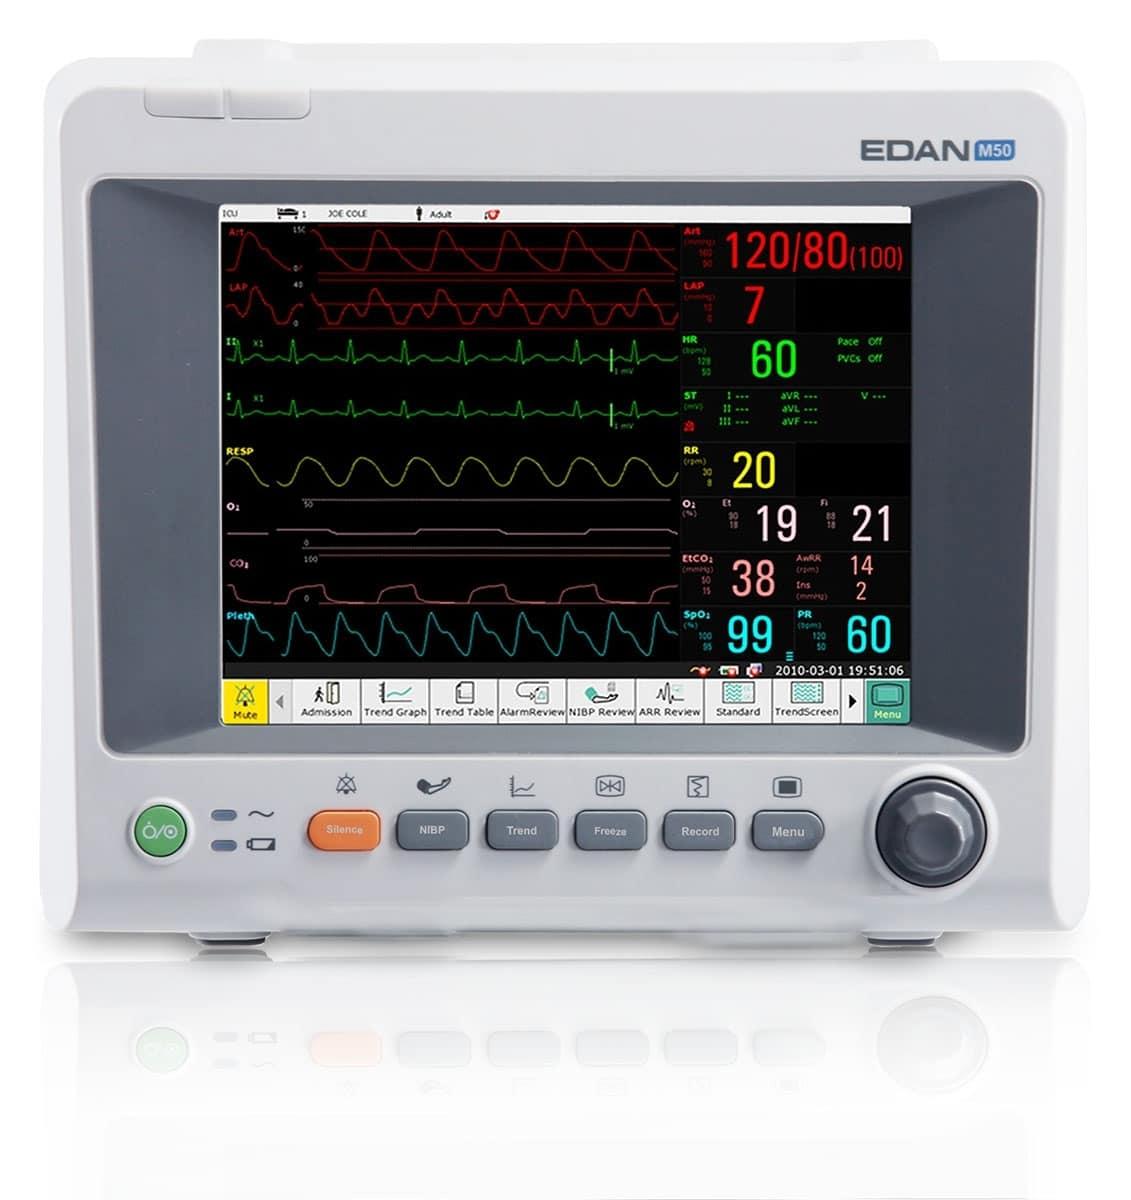 Edan iM50 Monitor (8.4 inch screen)